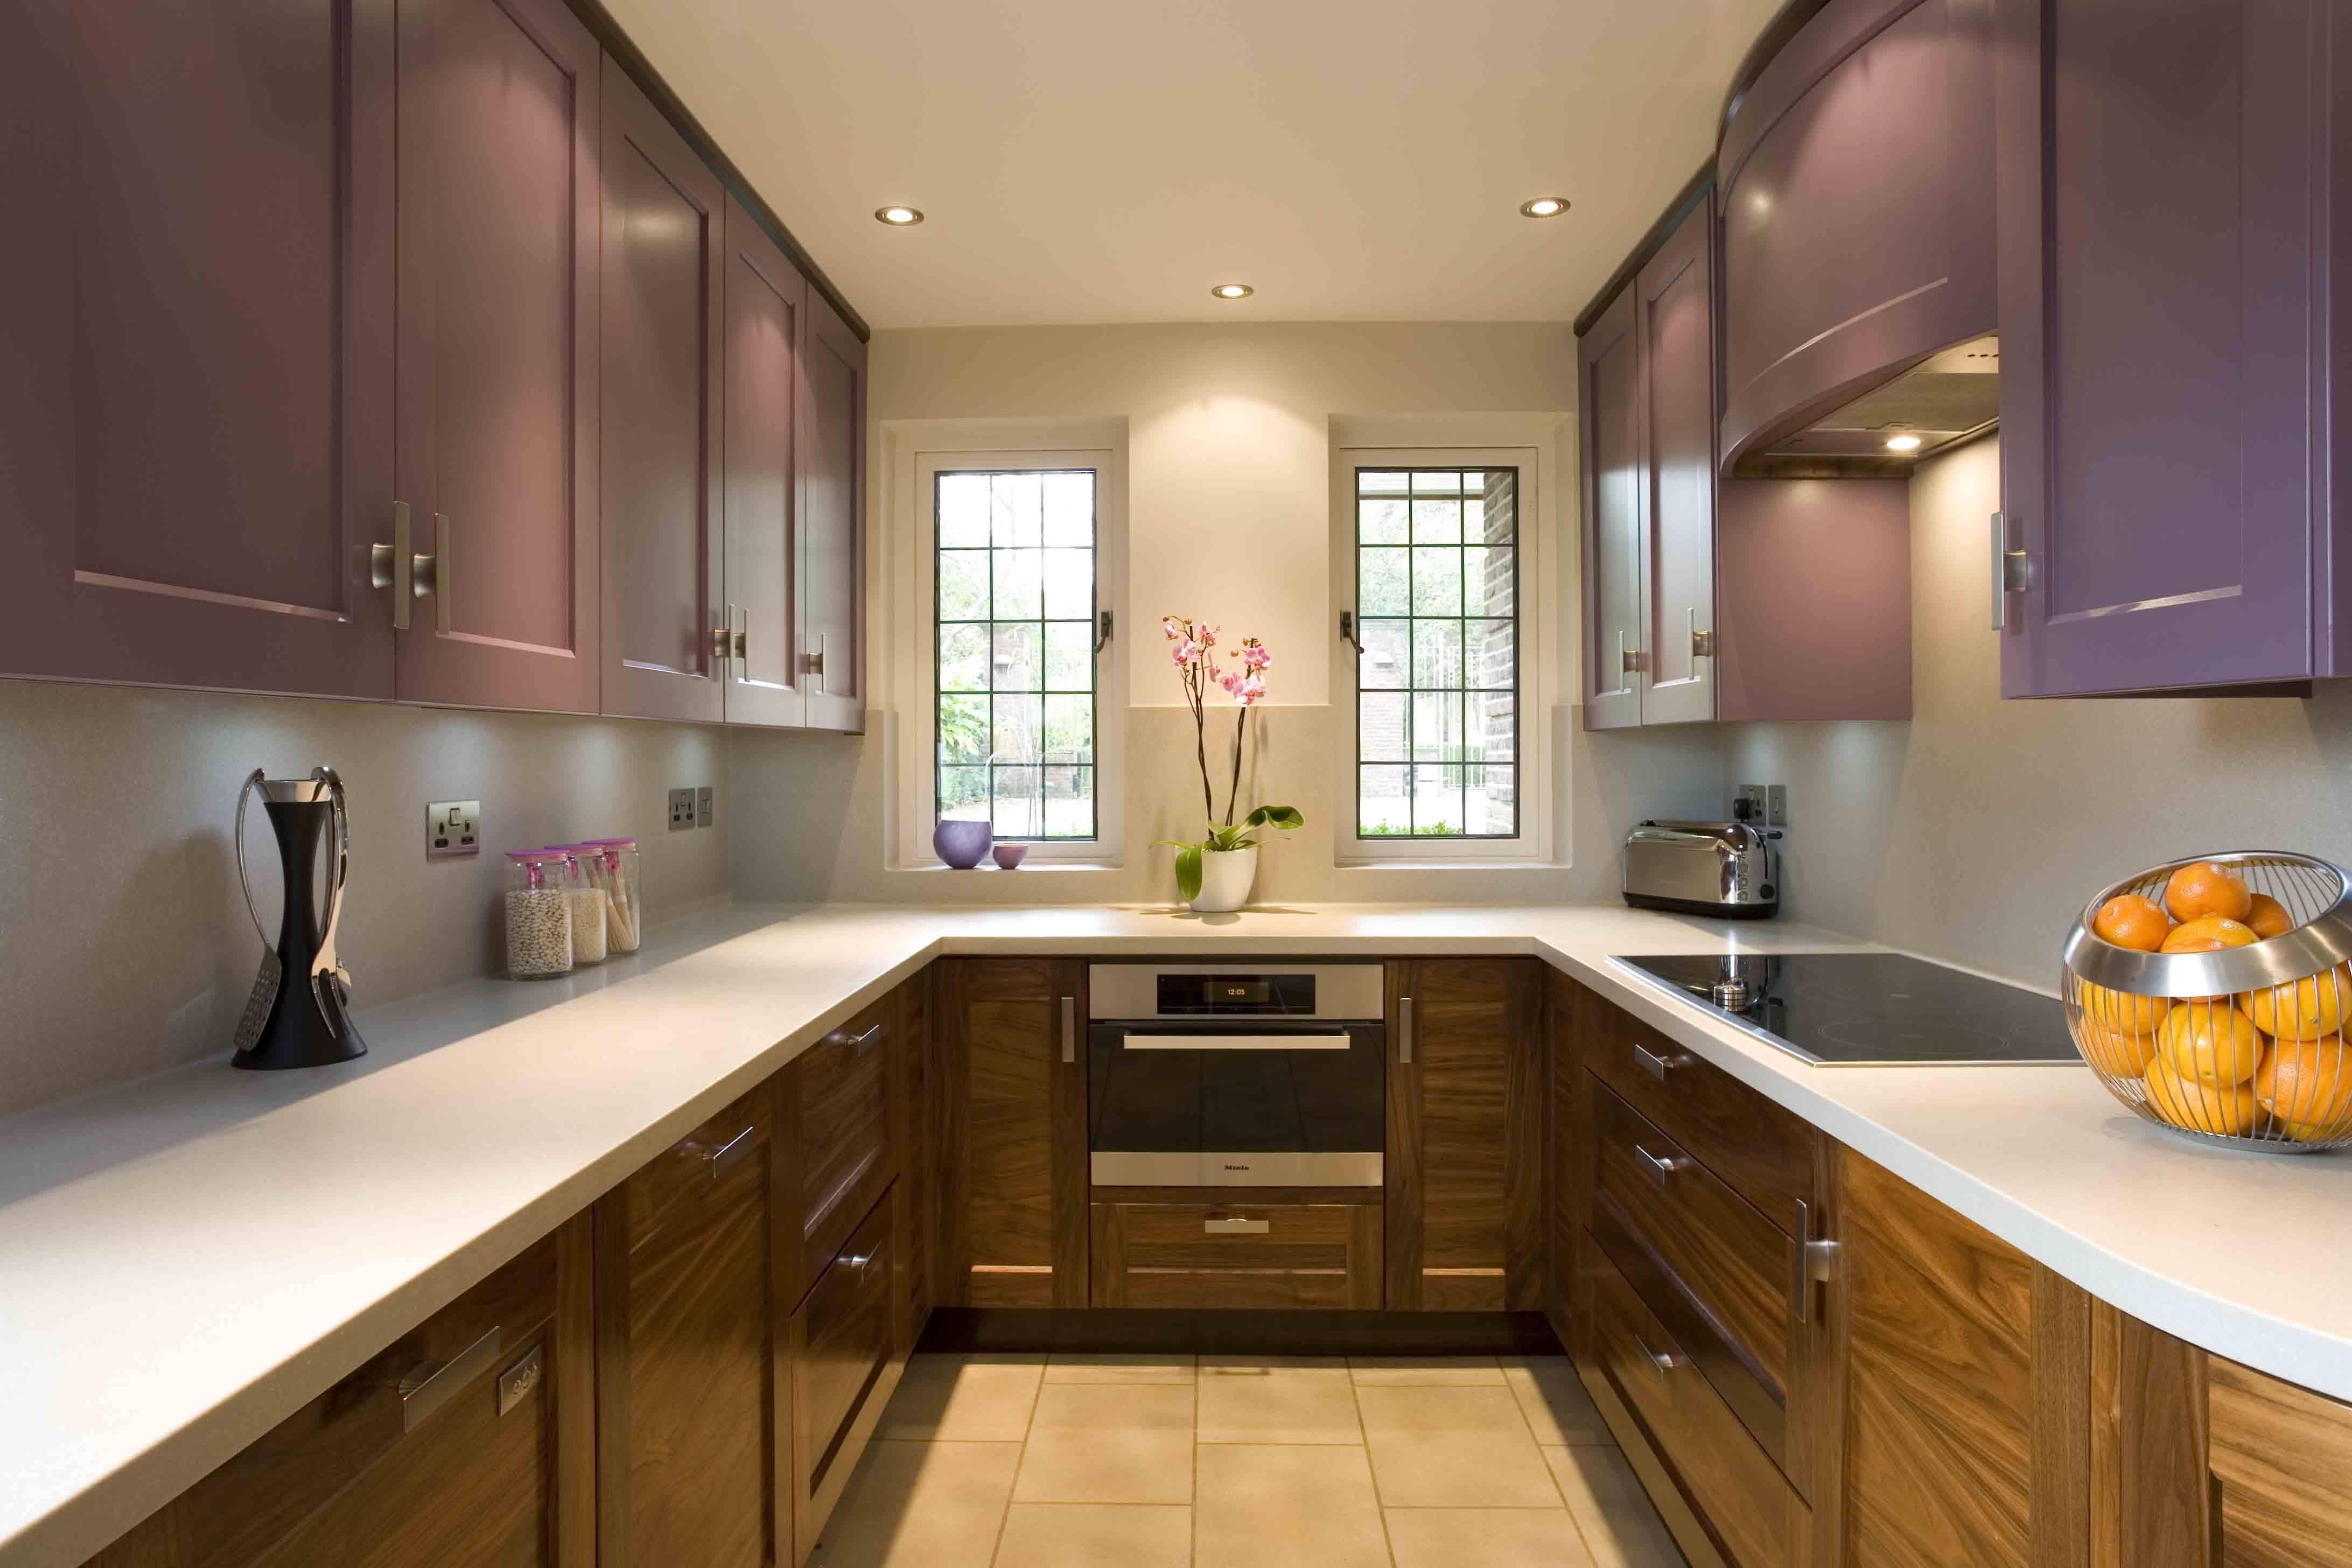 Кухня двухрядная 6 кв м дизайн